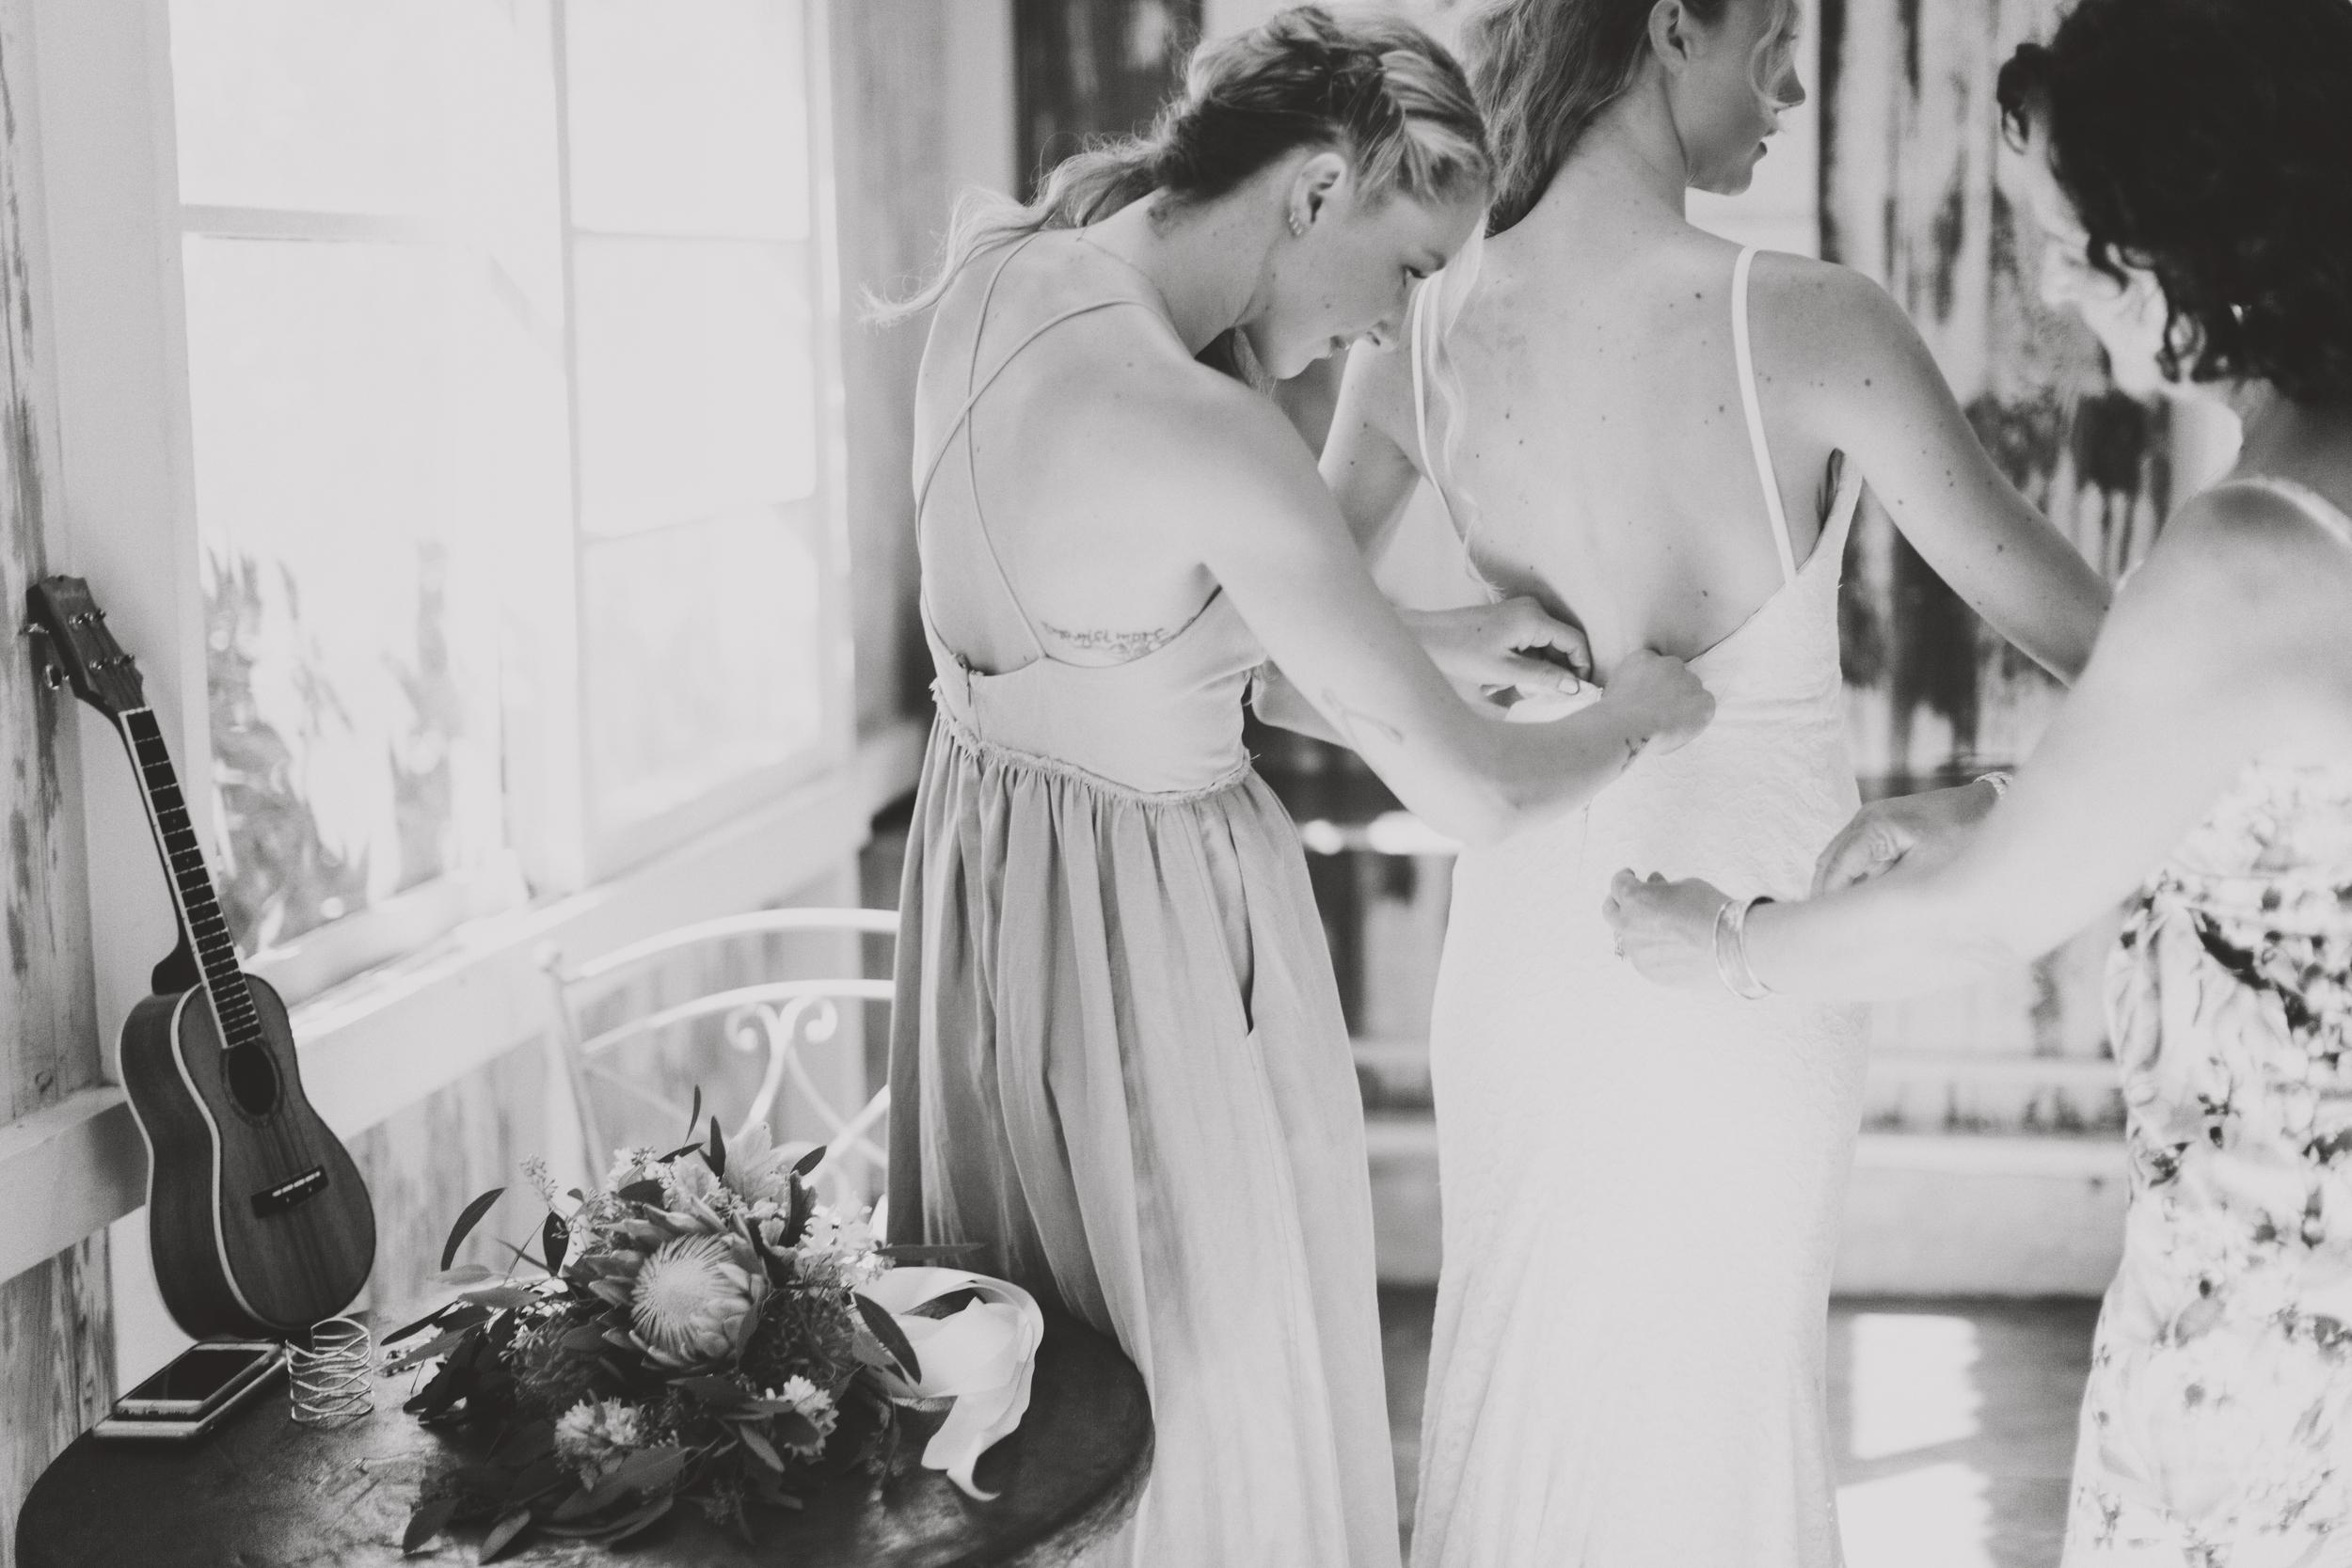 angie-diaz-photography-maui-wedding-27.jpg